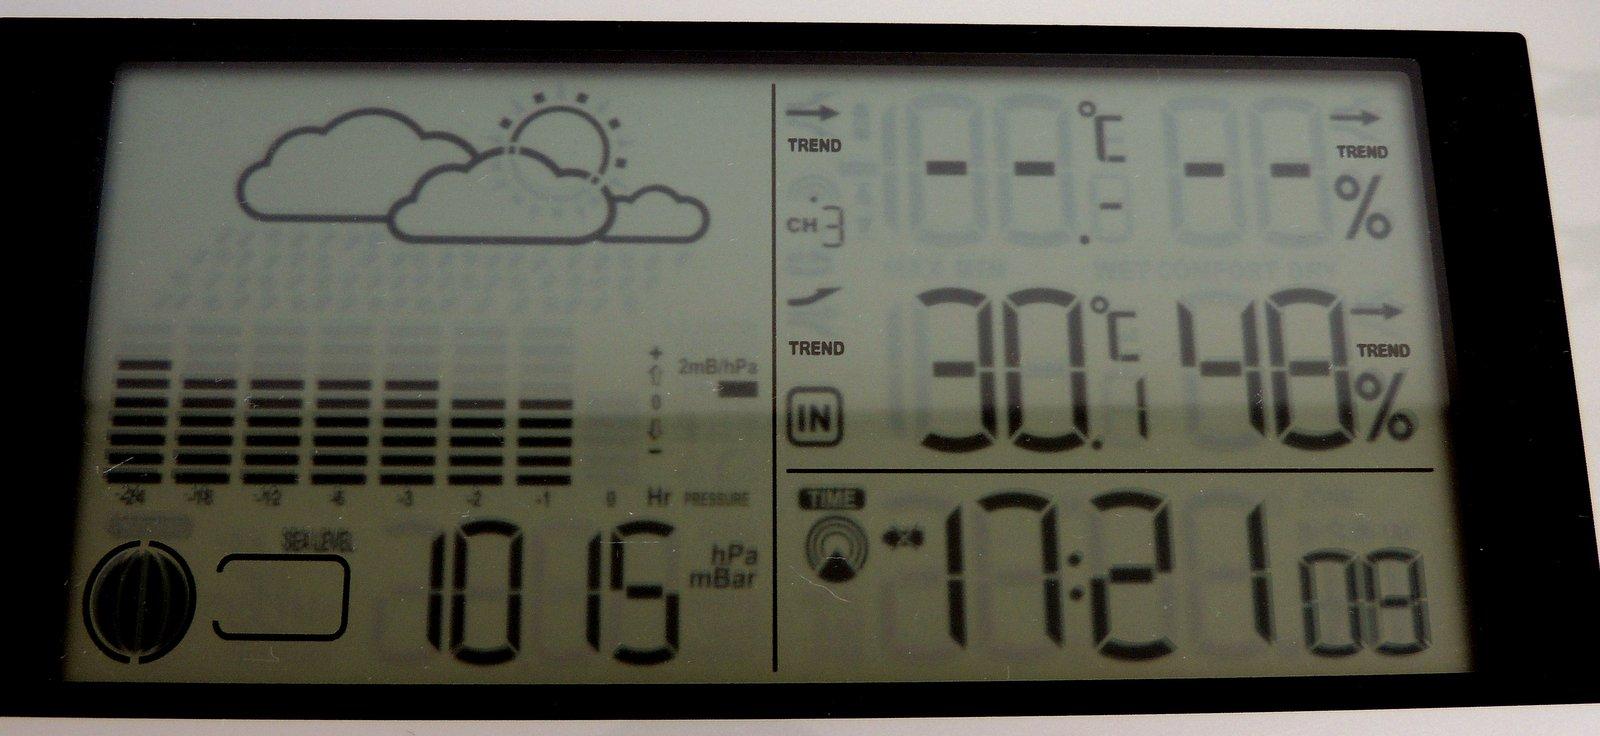 30,1 ° an der Nordsee um 17:21 Uhr